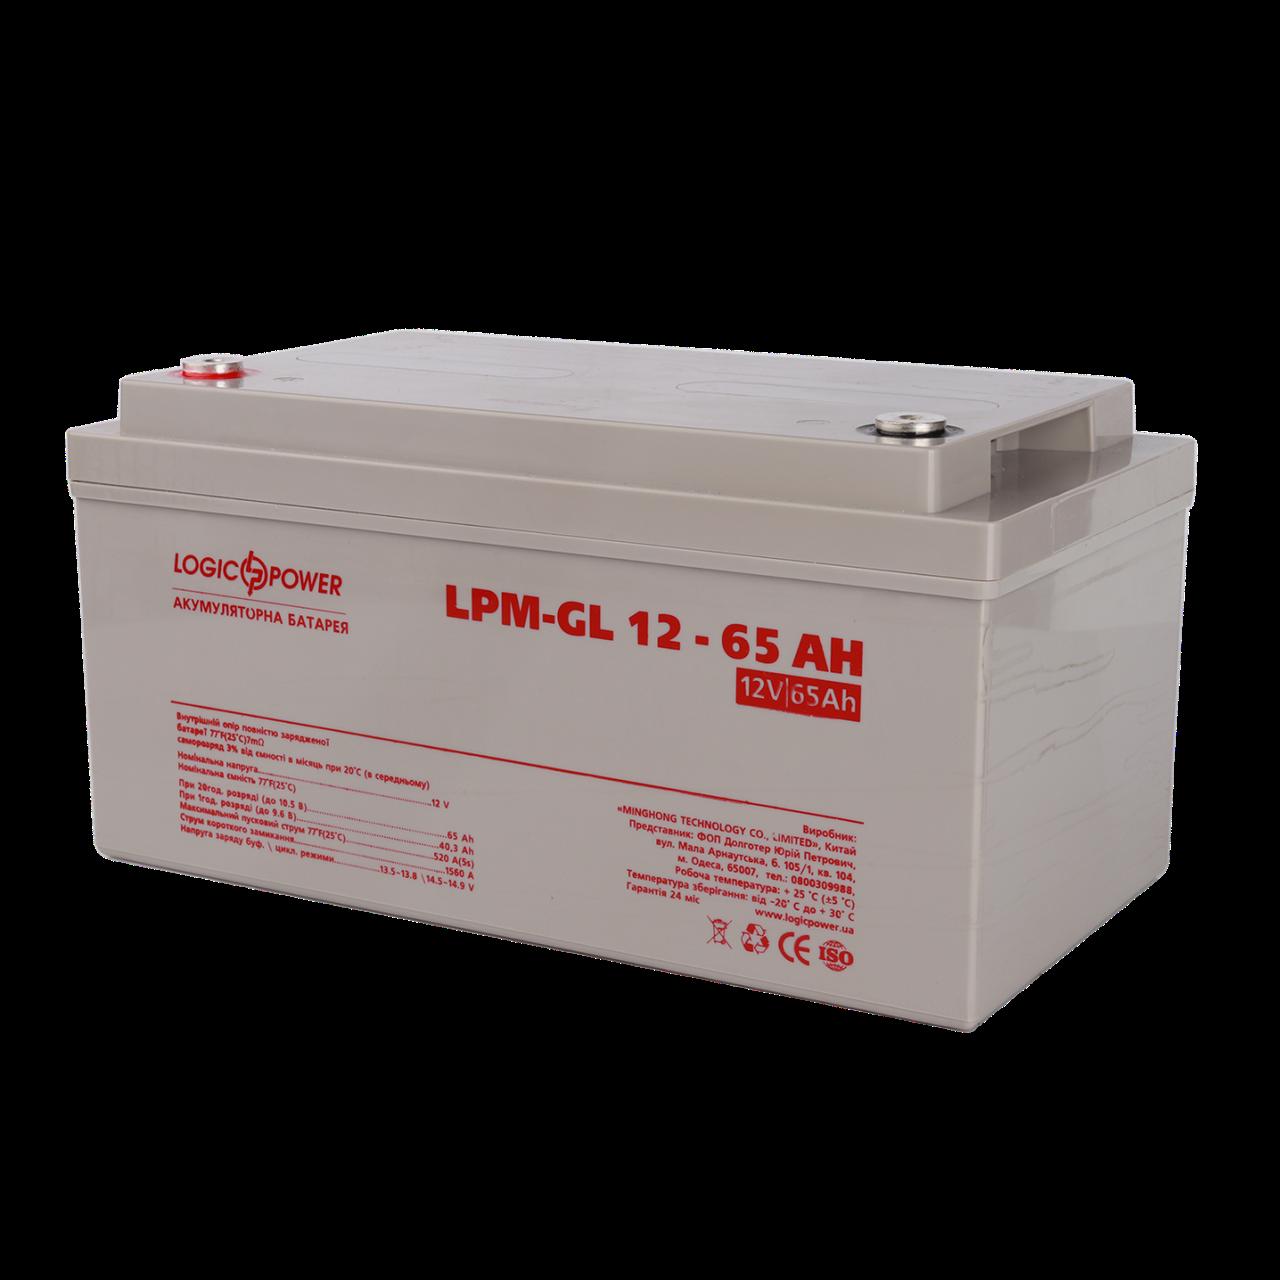 Аккумулятор гелевый LPU-GL 12 - 65 AH